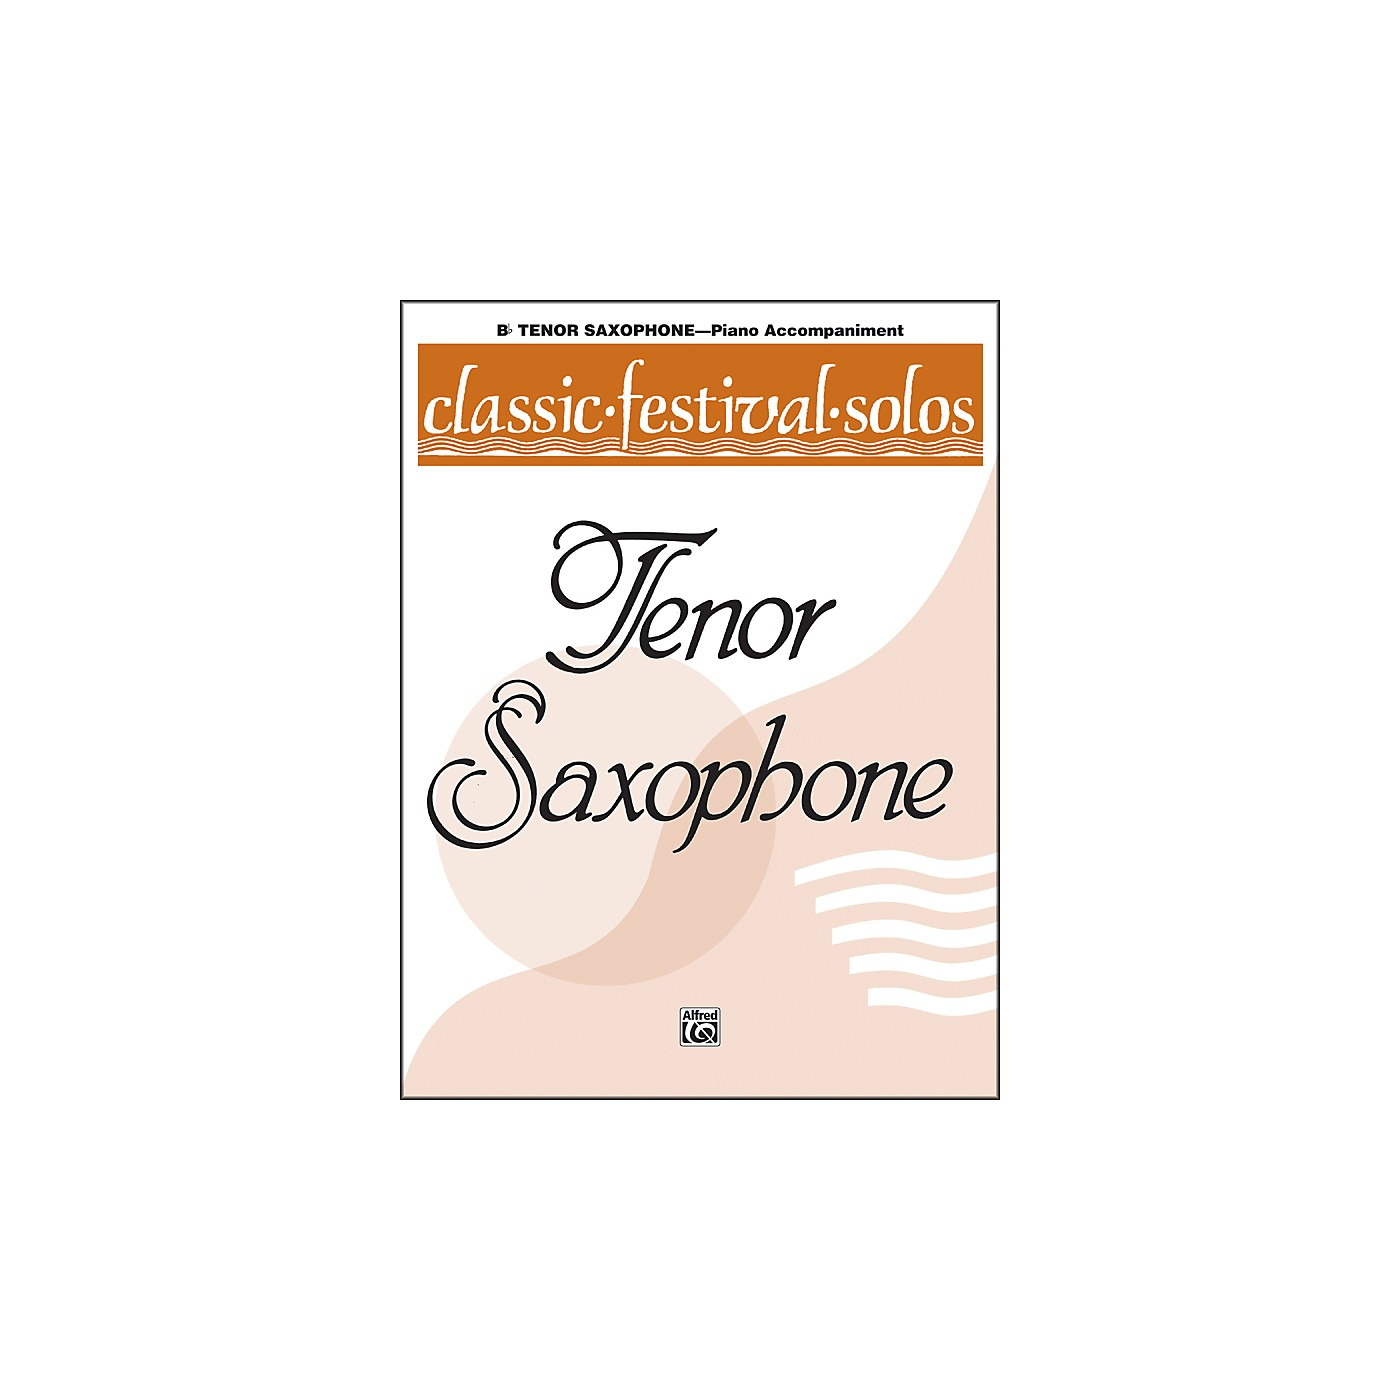 Alfred Classic Festival Solos (B-Flat Tenor Saxophone) Volume 1 Piano Acc. thumbnail